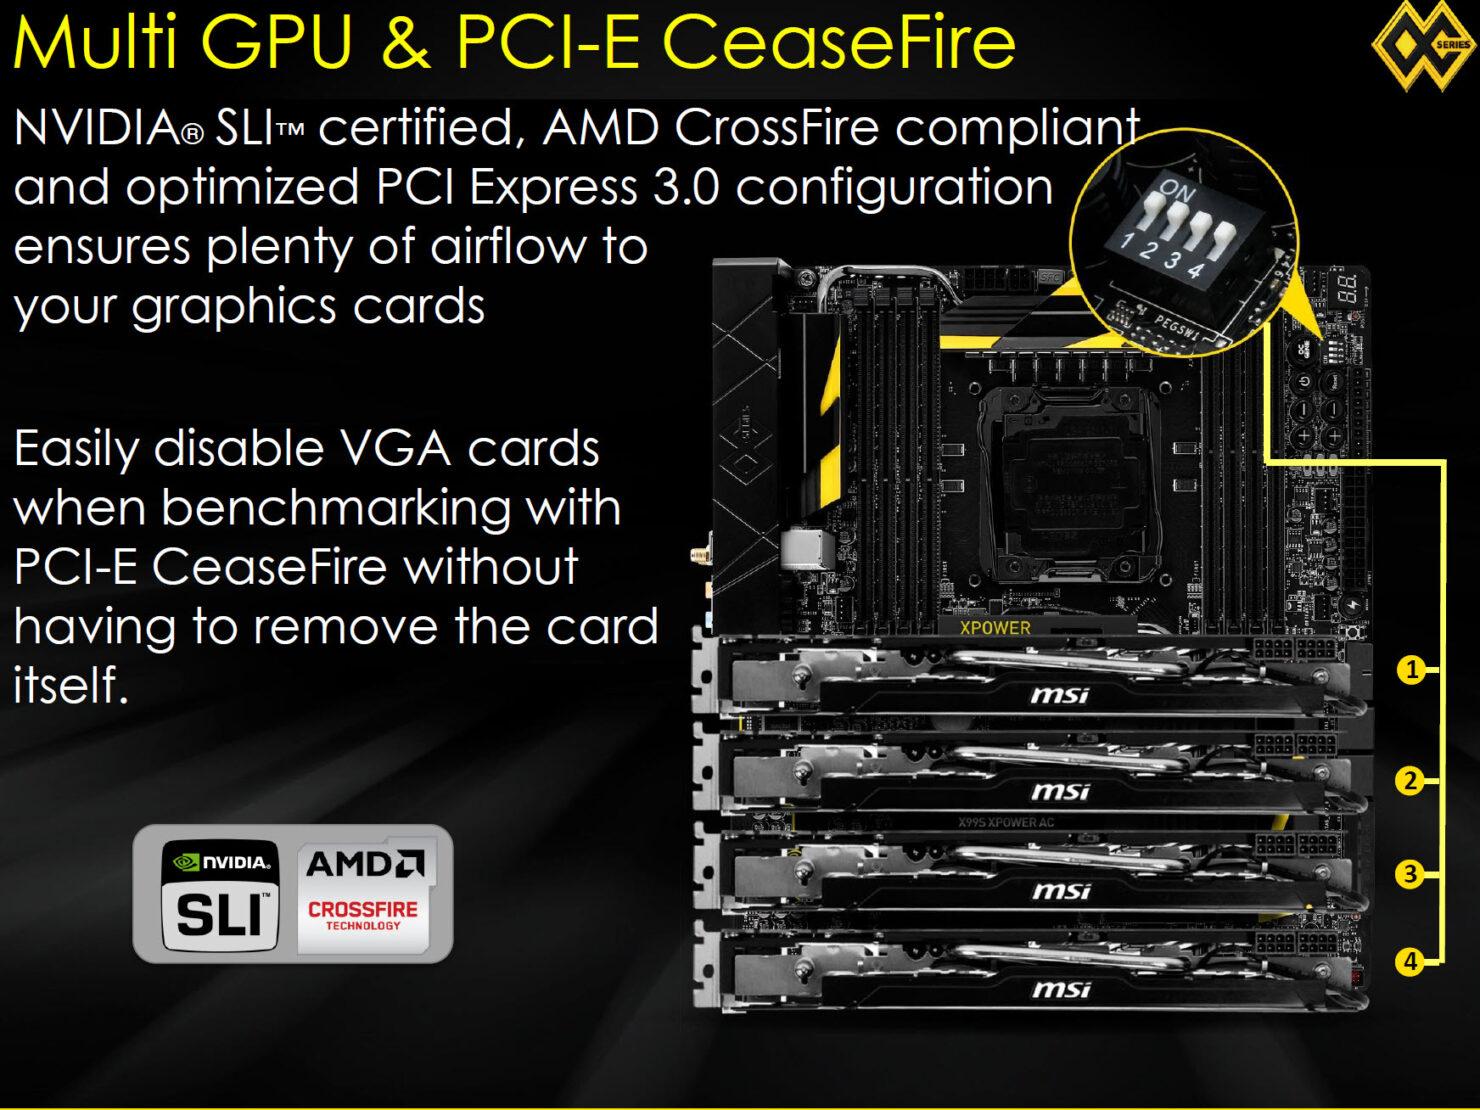 msi-x99-motherboard-press-slides_5